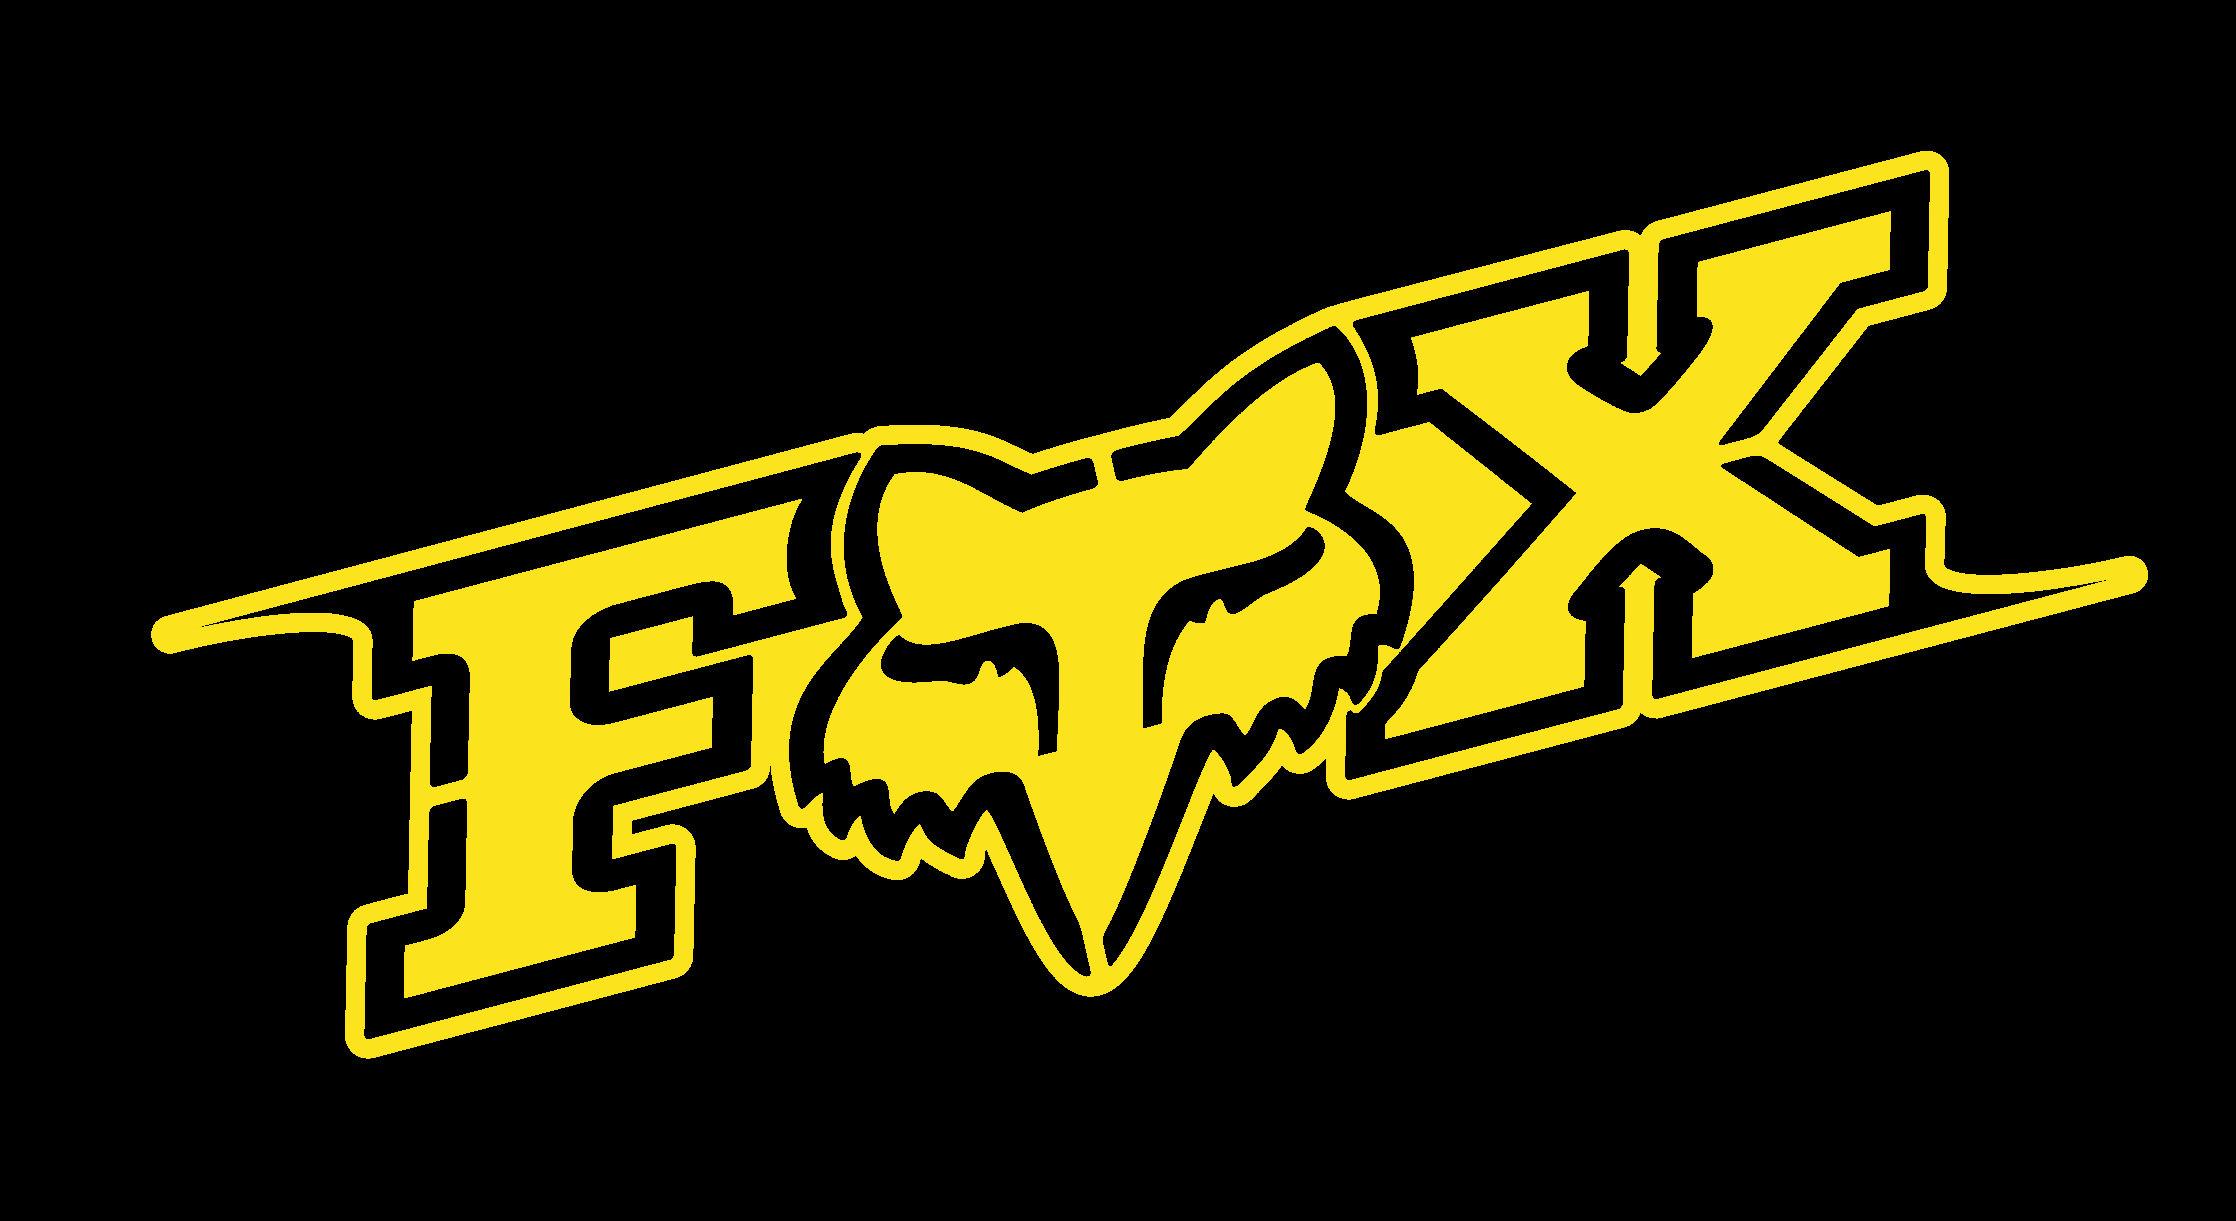 Fox Racing Wallpaper 806870 F1 Racing Wallpaper 796653 Fox Racing 2236x1221